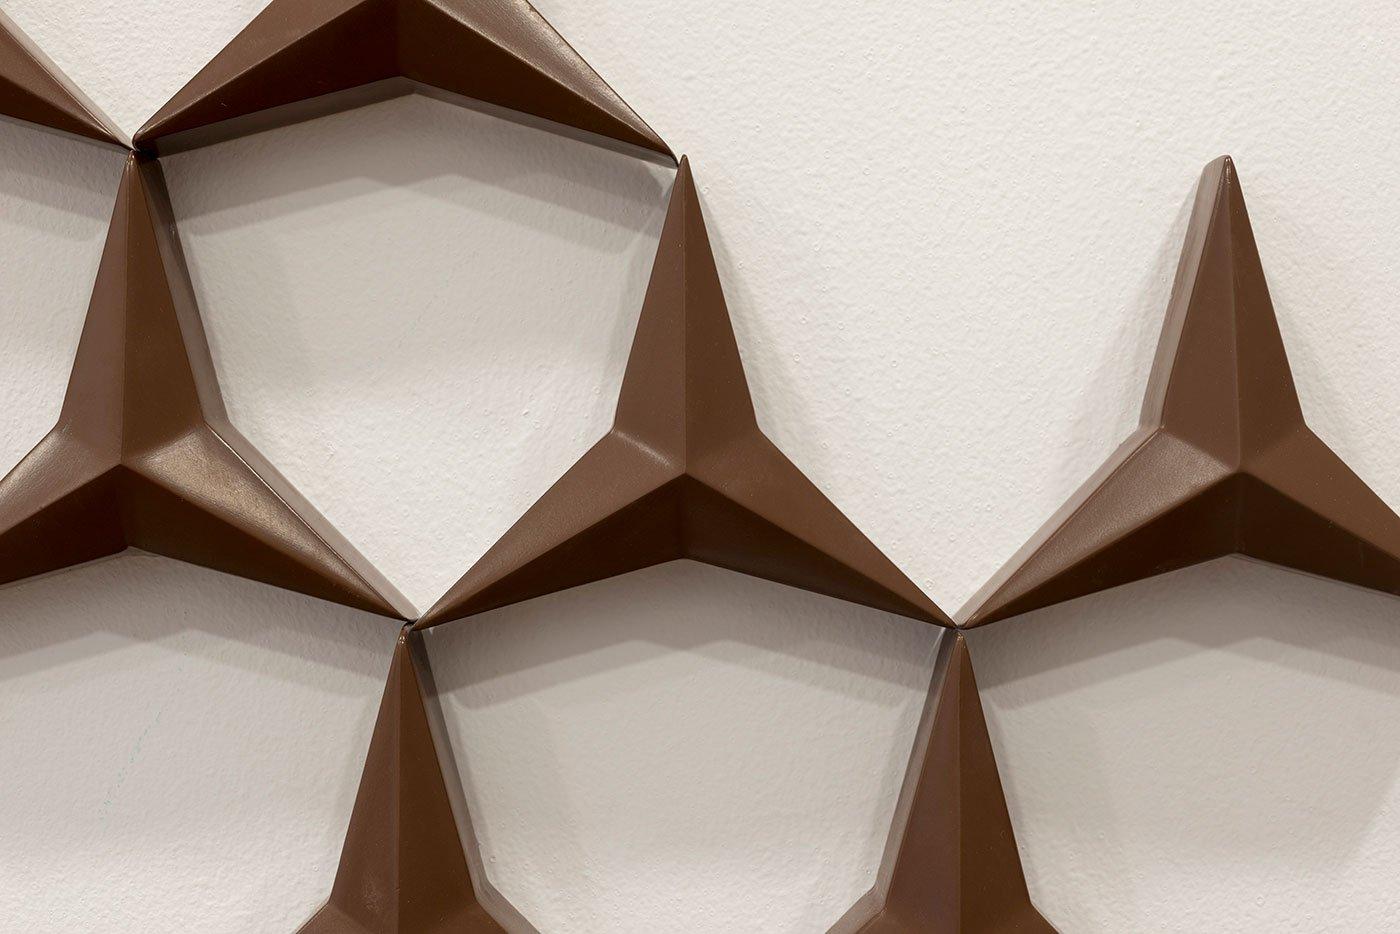 motif interior design detail